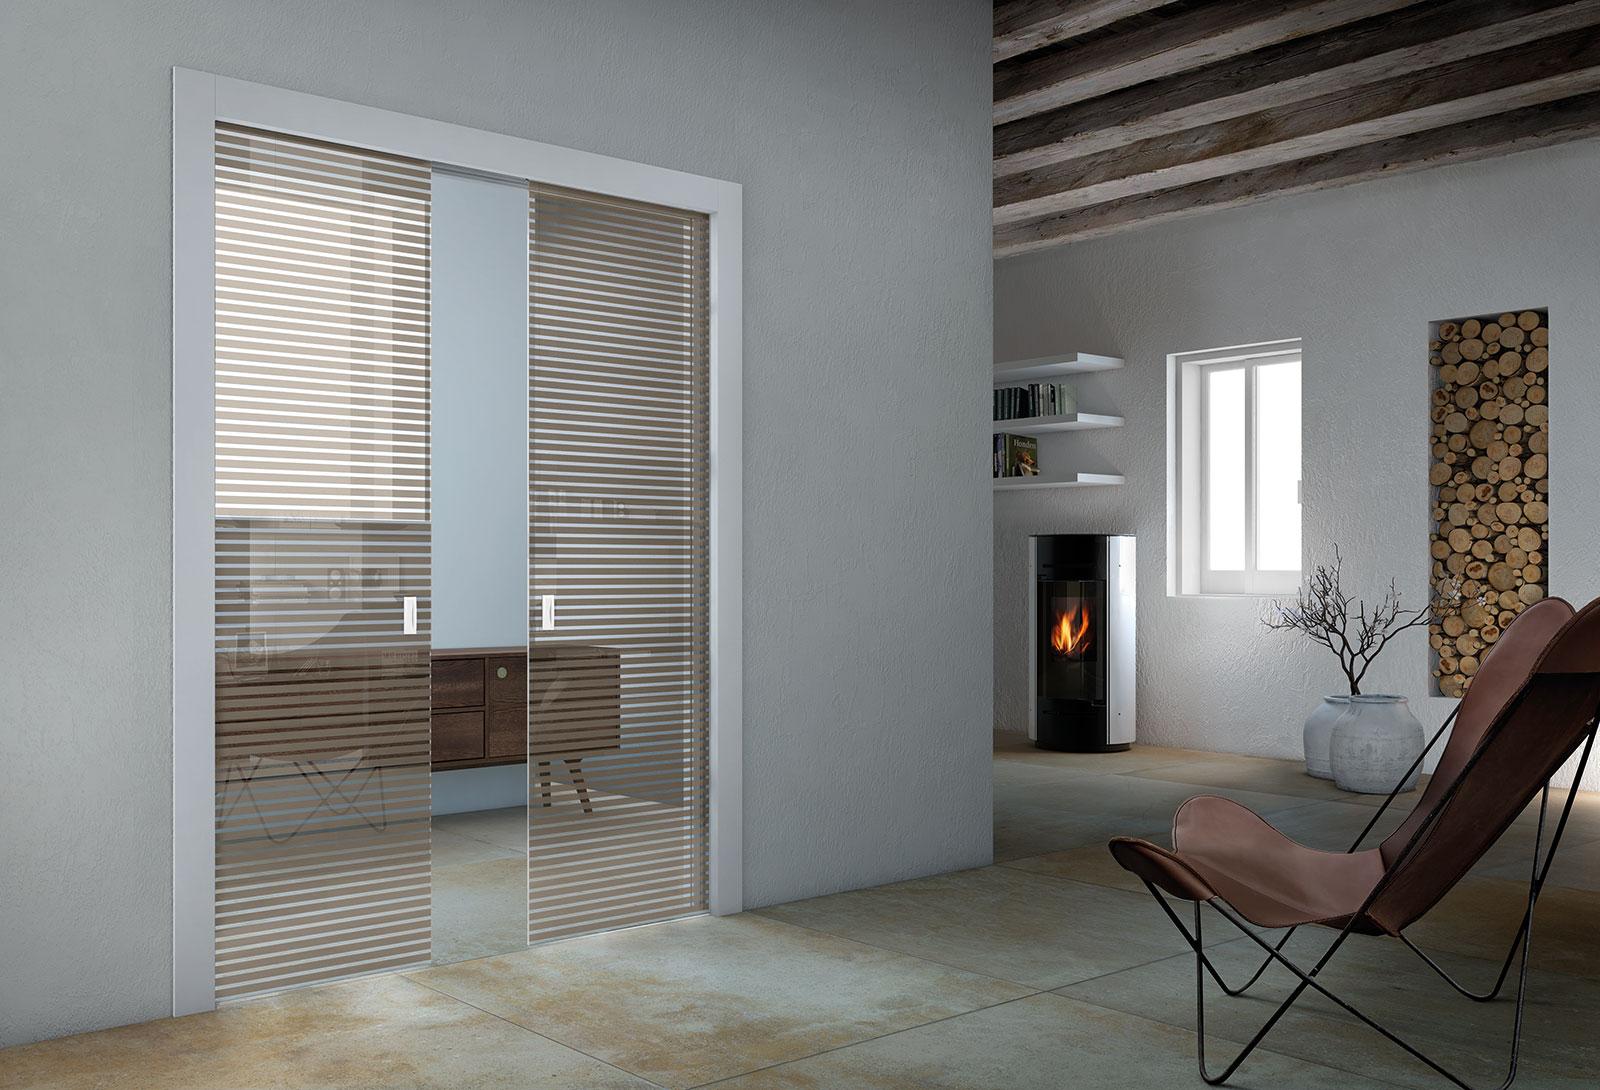 Porte Tutto Vetro Scorrevoli.Porte Scorrevoli In Vetro Il Design Tuttovetro Henry Glass